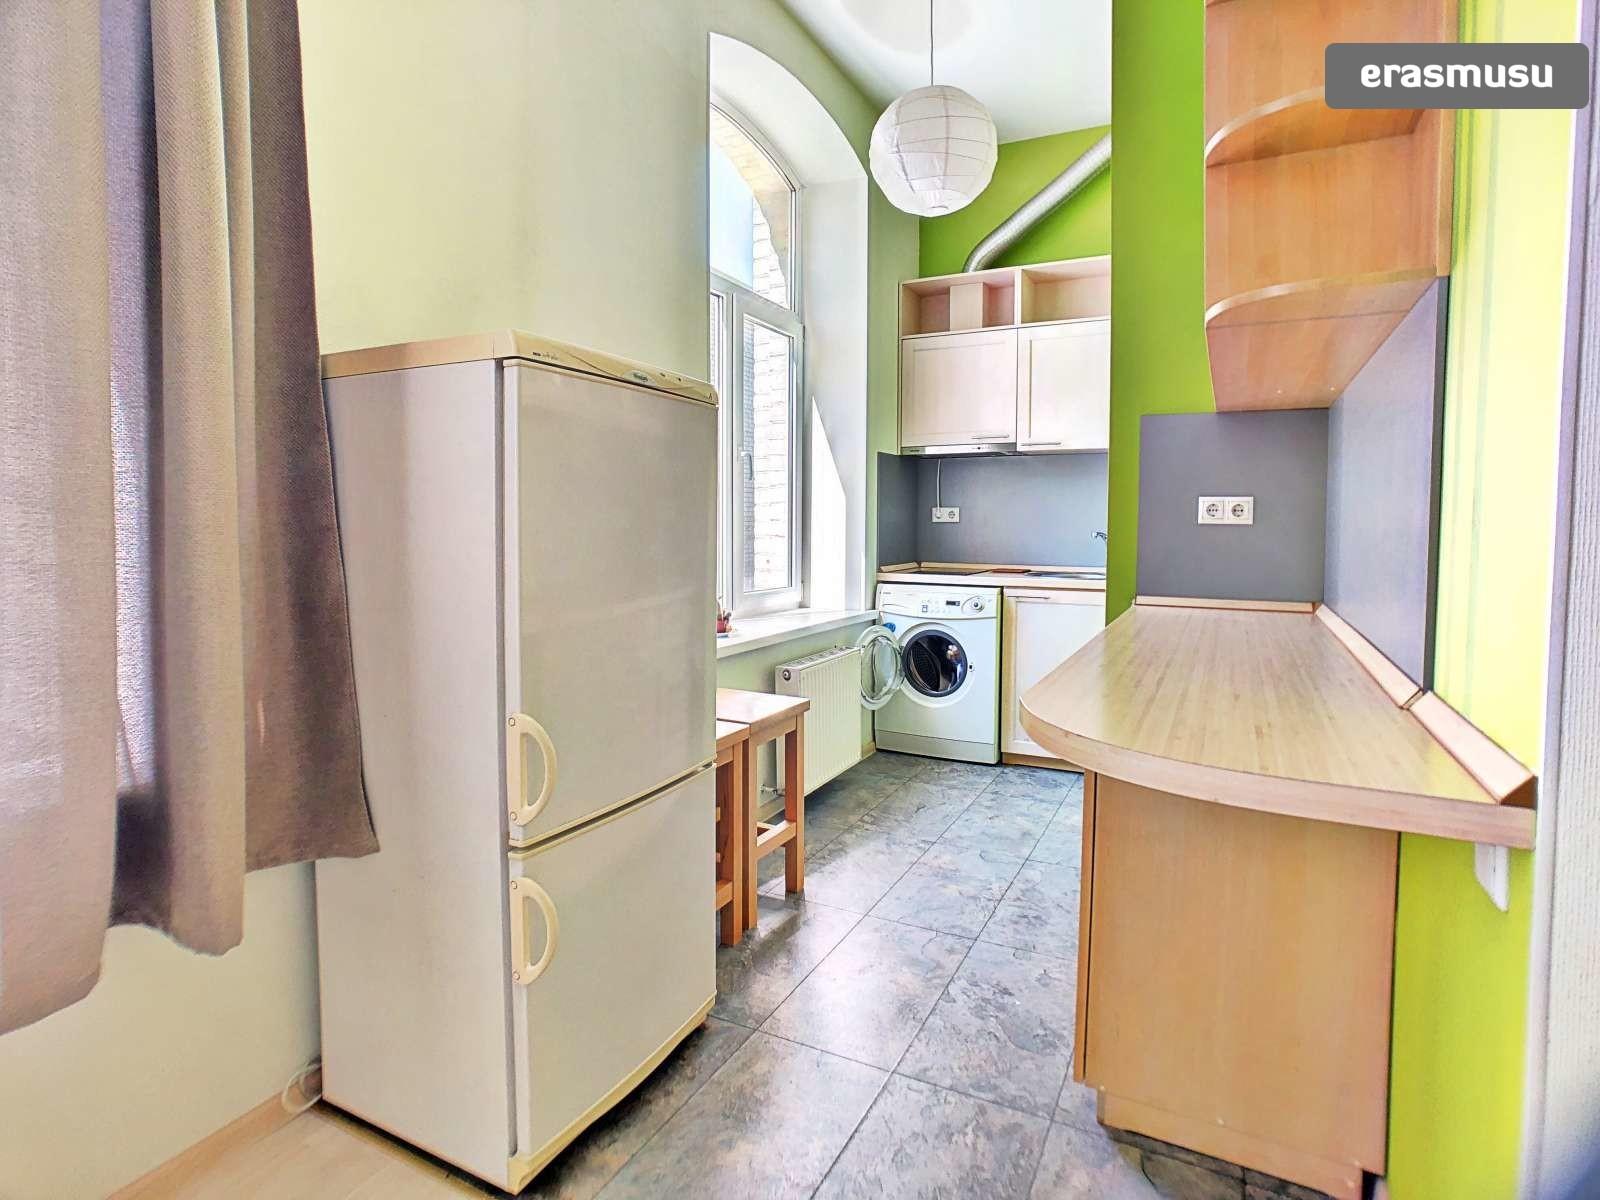 cheery-cute-studio-apartment-rent-dzirciems-c7cd664732c0002cc012